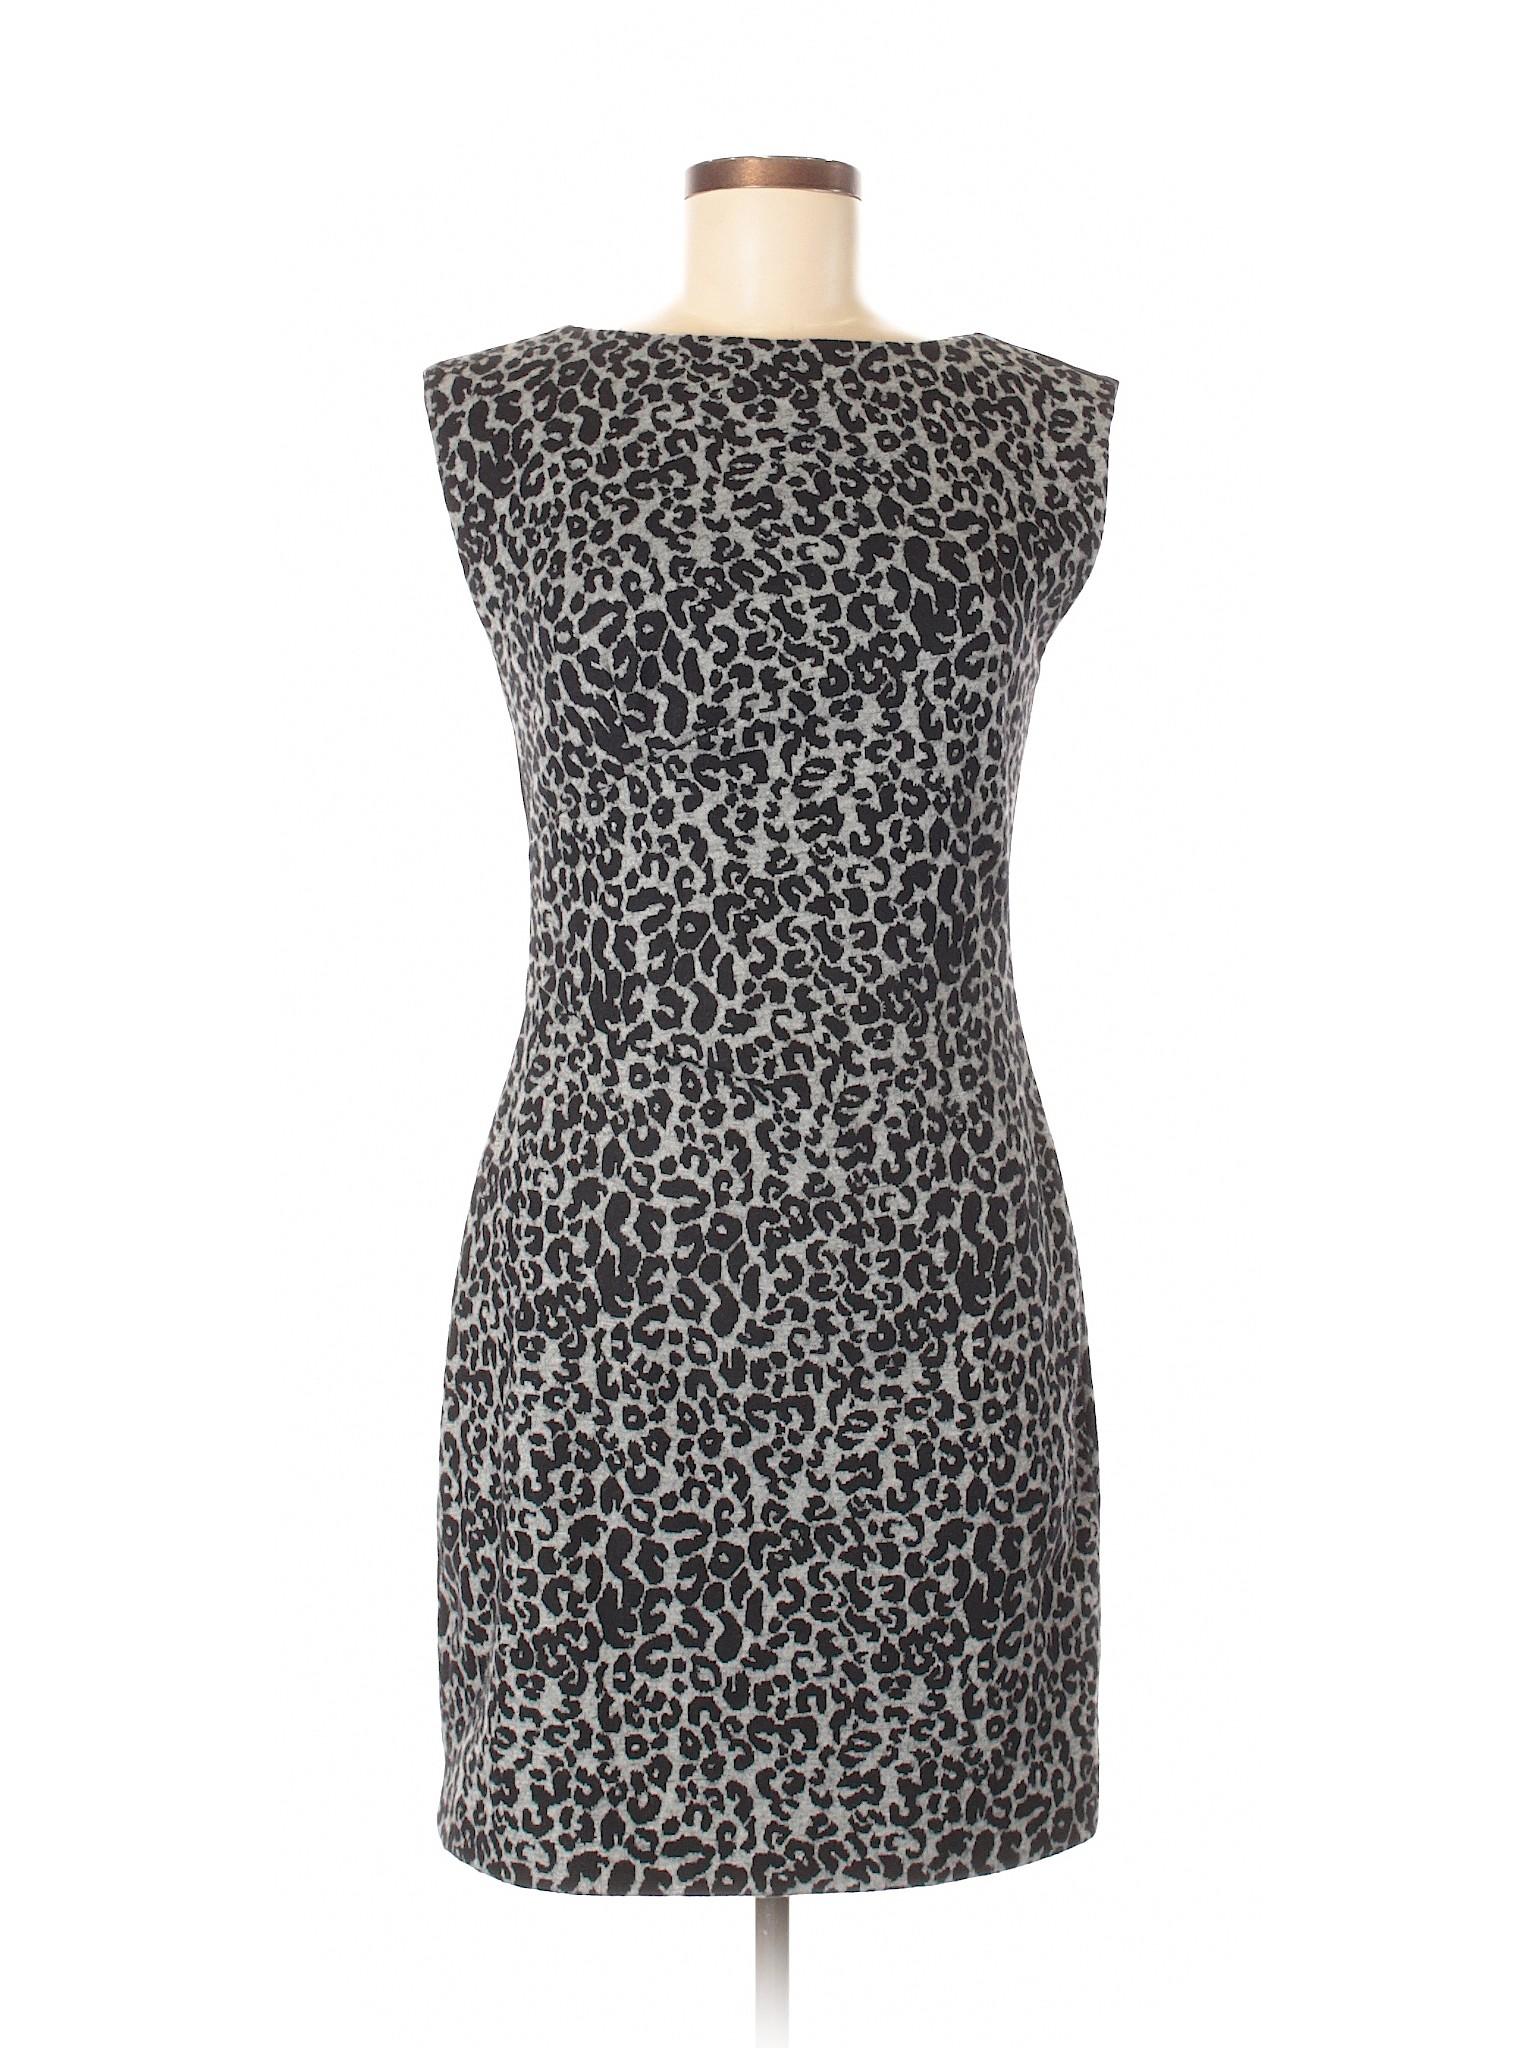 Casual winter Taylor Boutique Dress Rebecca 61ZqWwYA